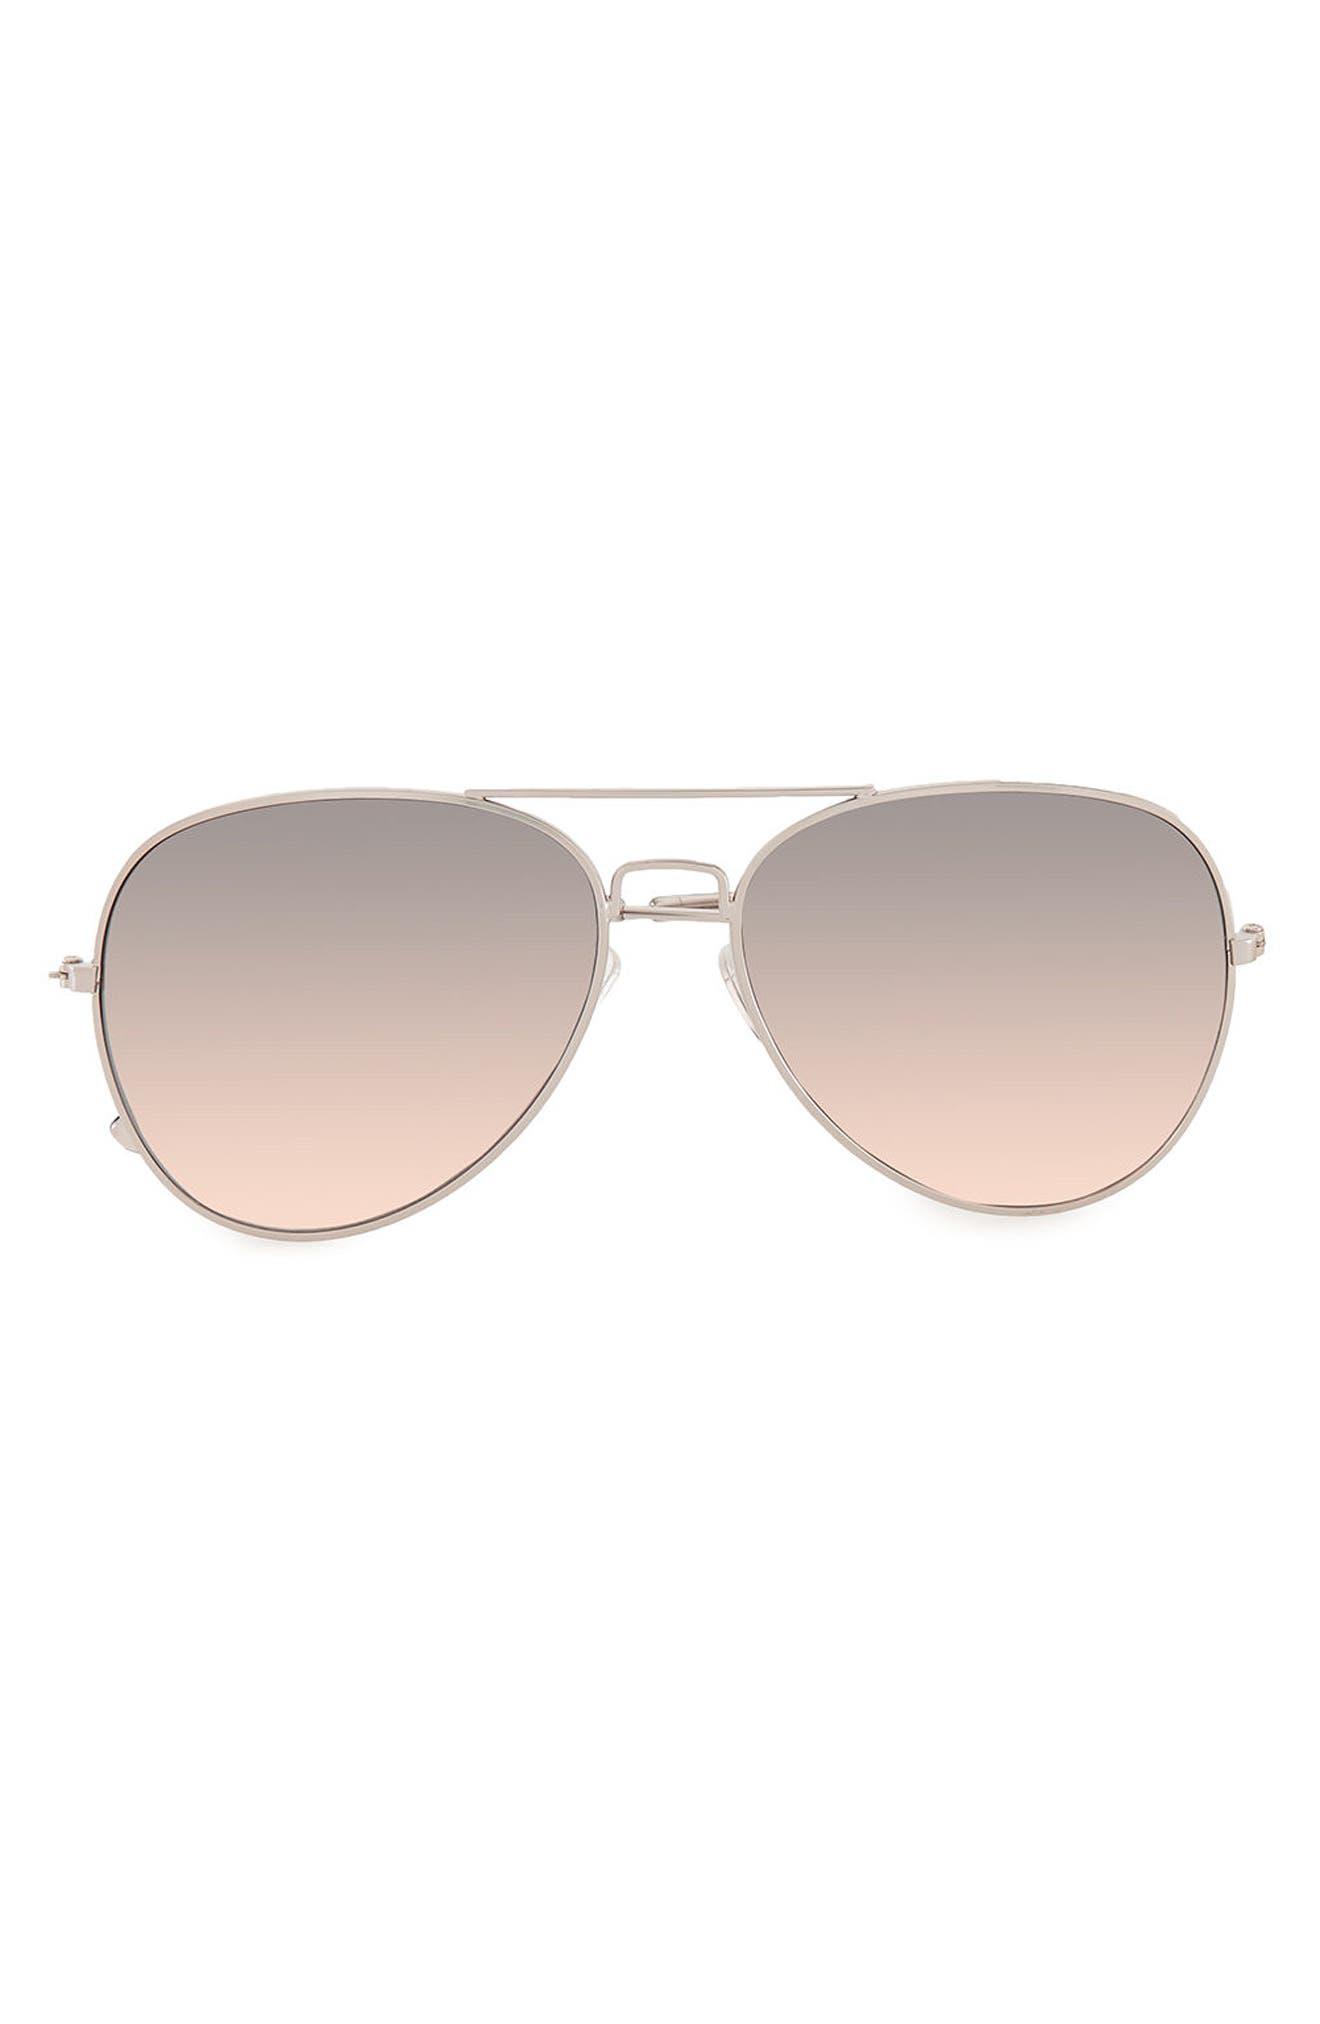 58mm Mirrored Aviator Sunglasses,                         Main,                         color, 040